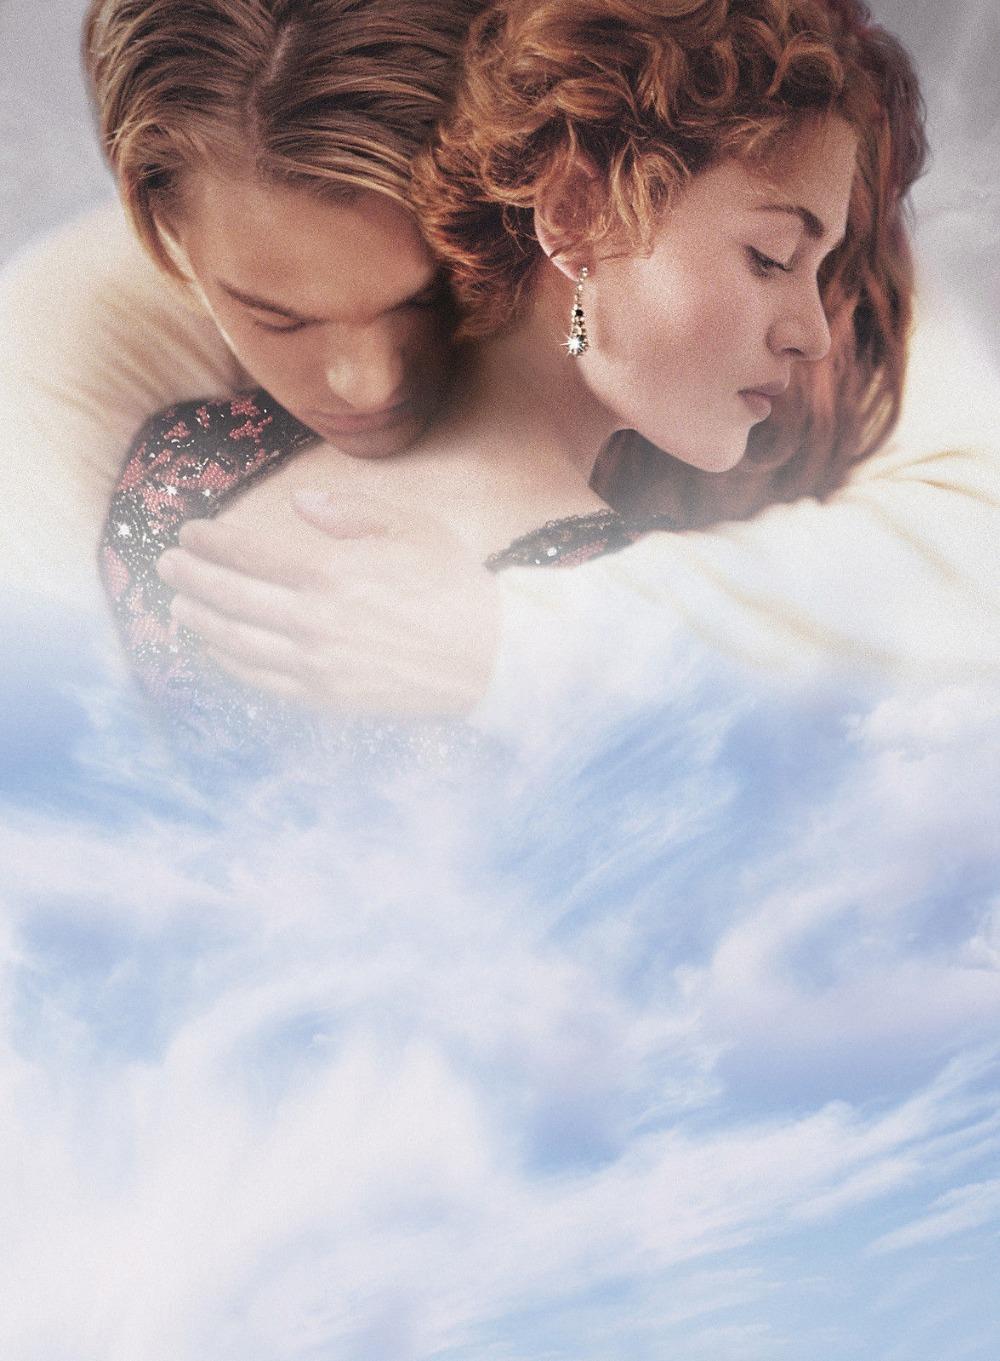 «Титаник Фильм 1943» — 2007